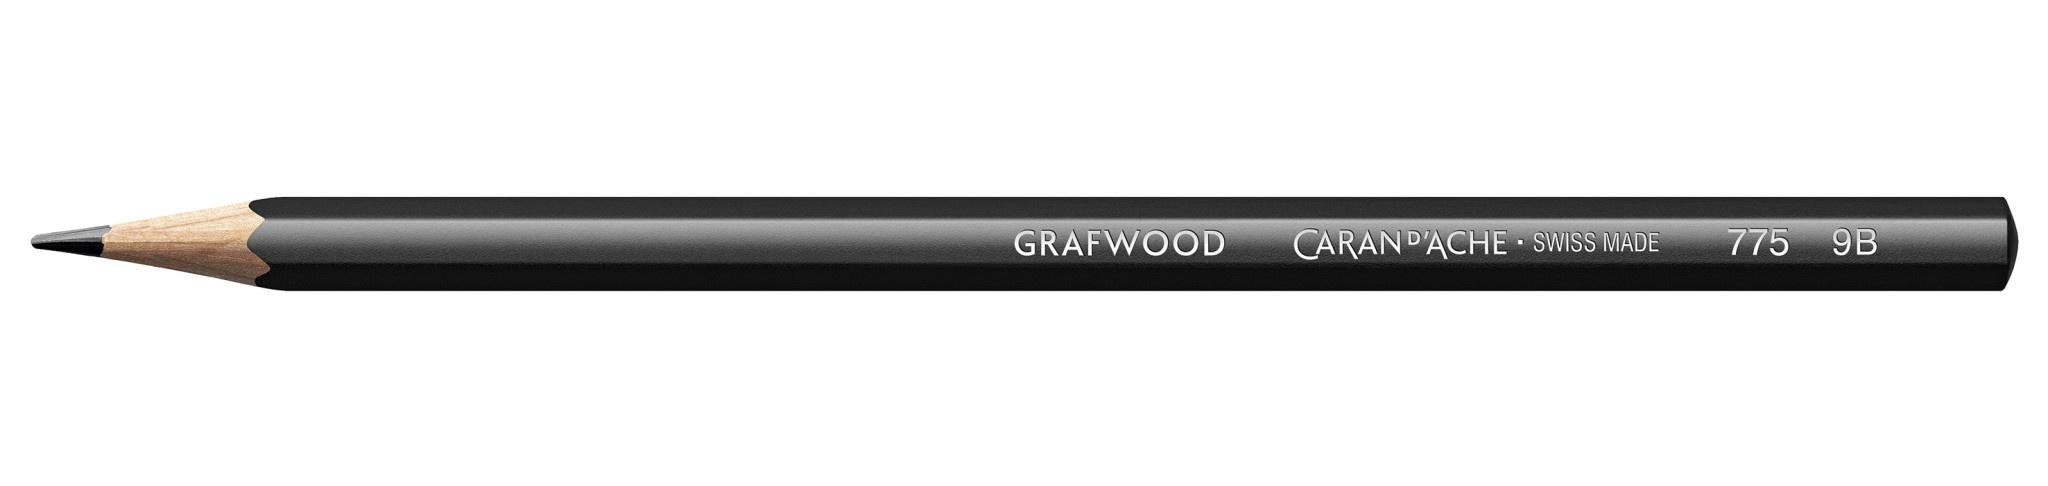 Caran d'Ache caran d'ache grafwood 9B